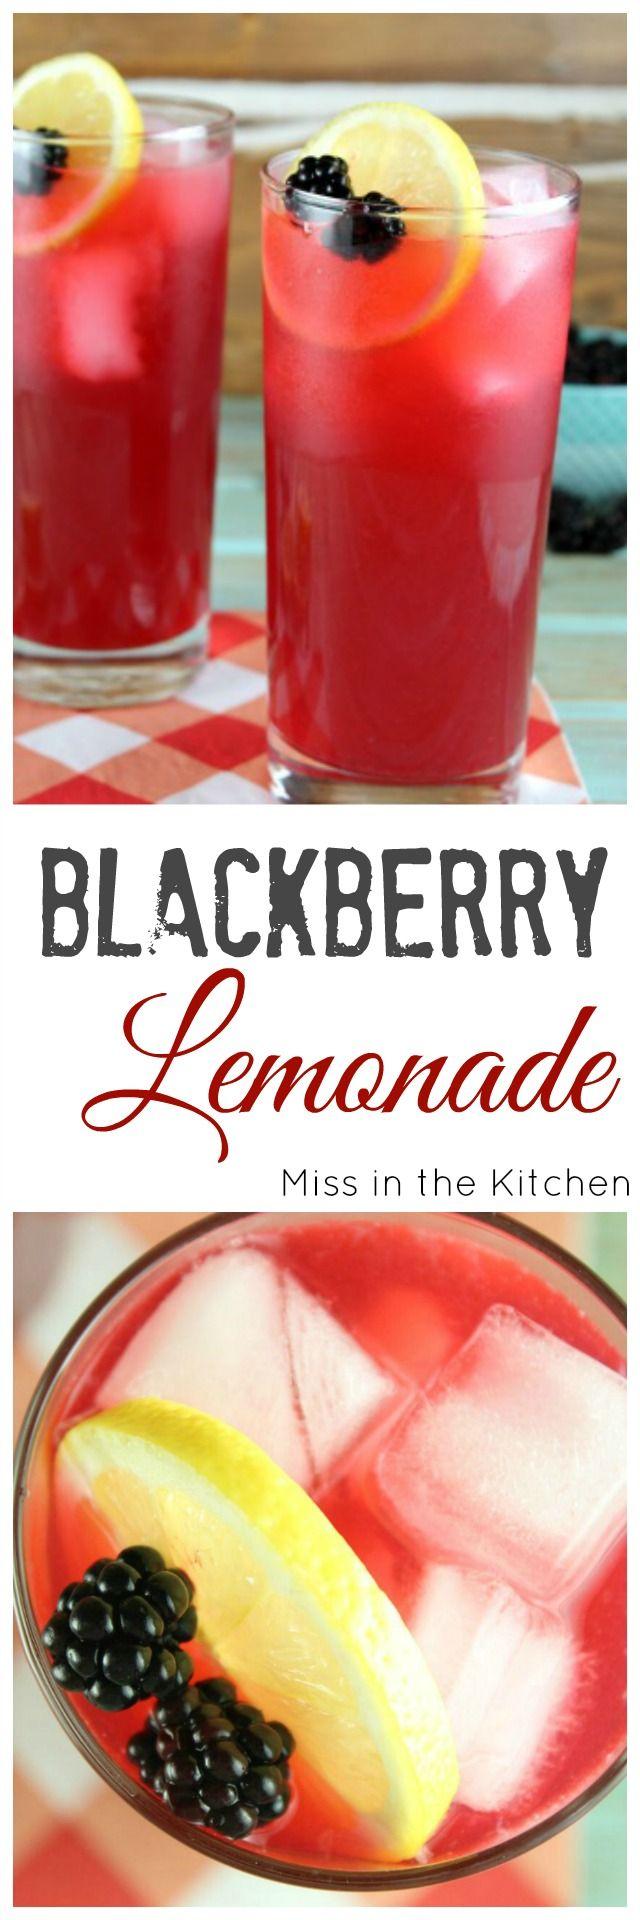 Blackberry Lemonade Recipe to make all summer long! From MissintheKitchen.com